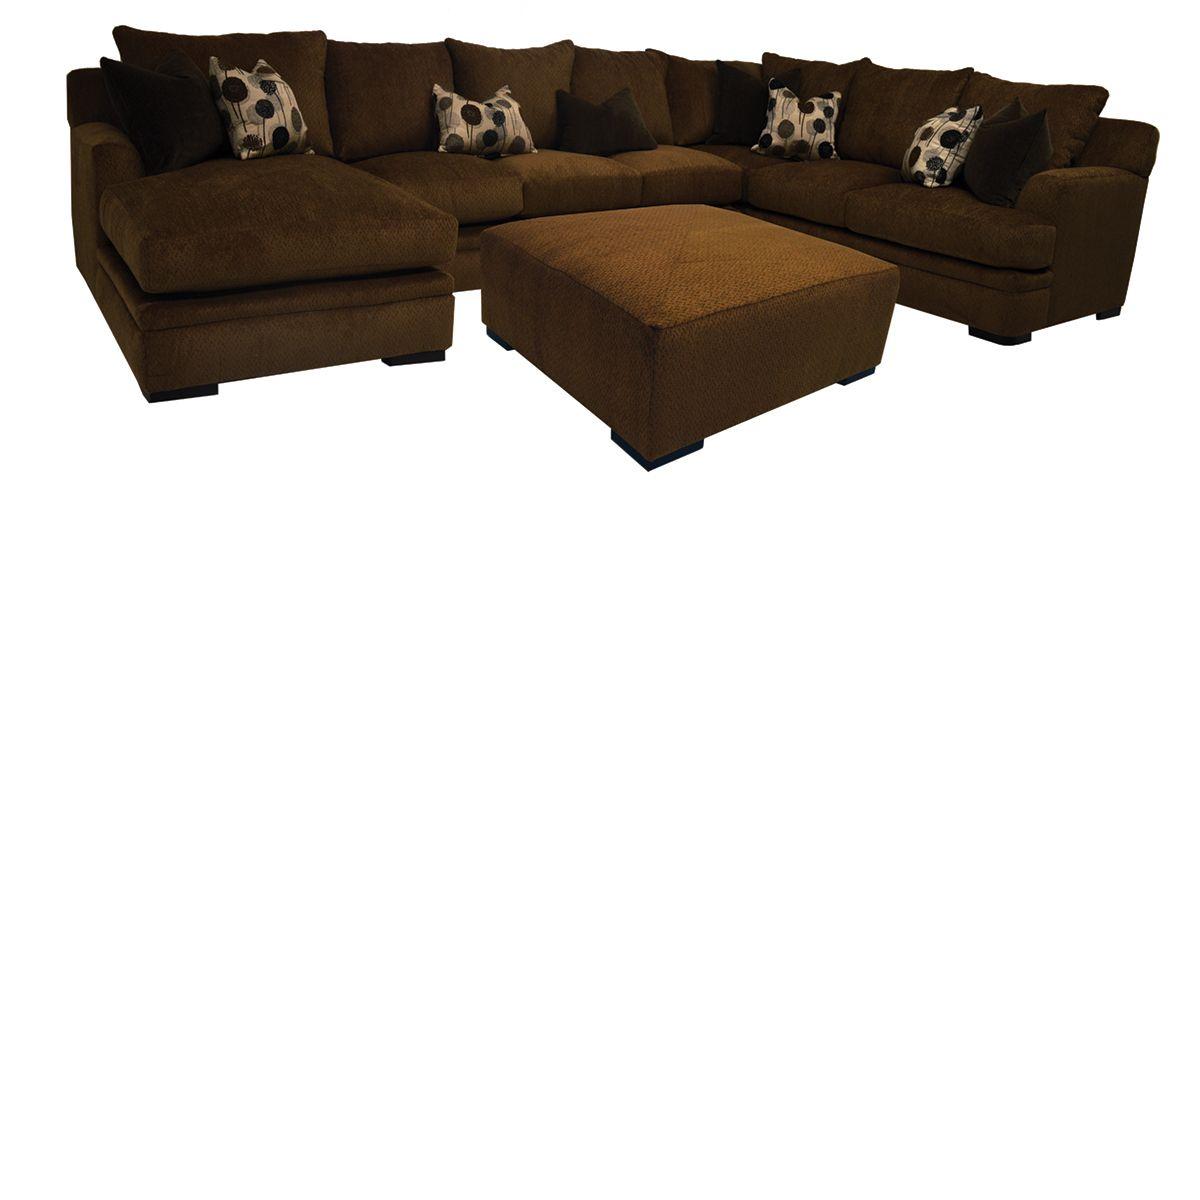 The Dump Furniture - AMALFI PATRIOT SECTIONAL   Home Decor that I ...